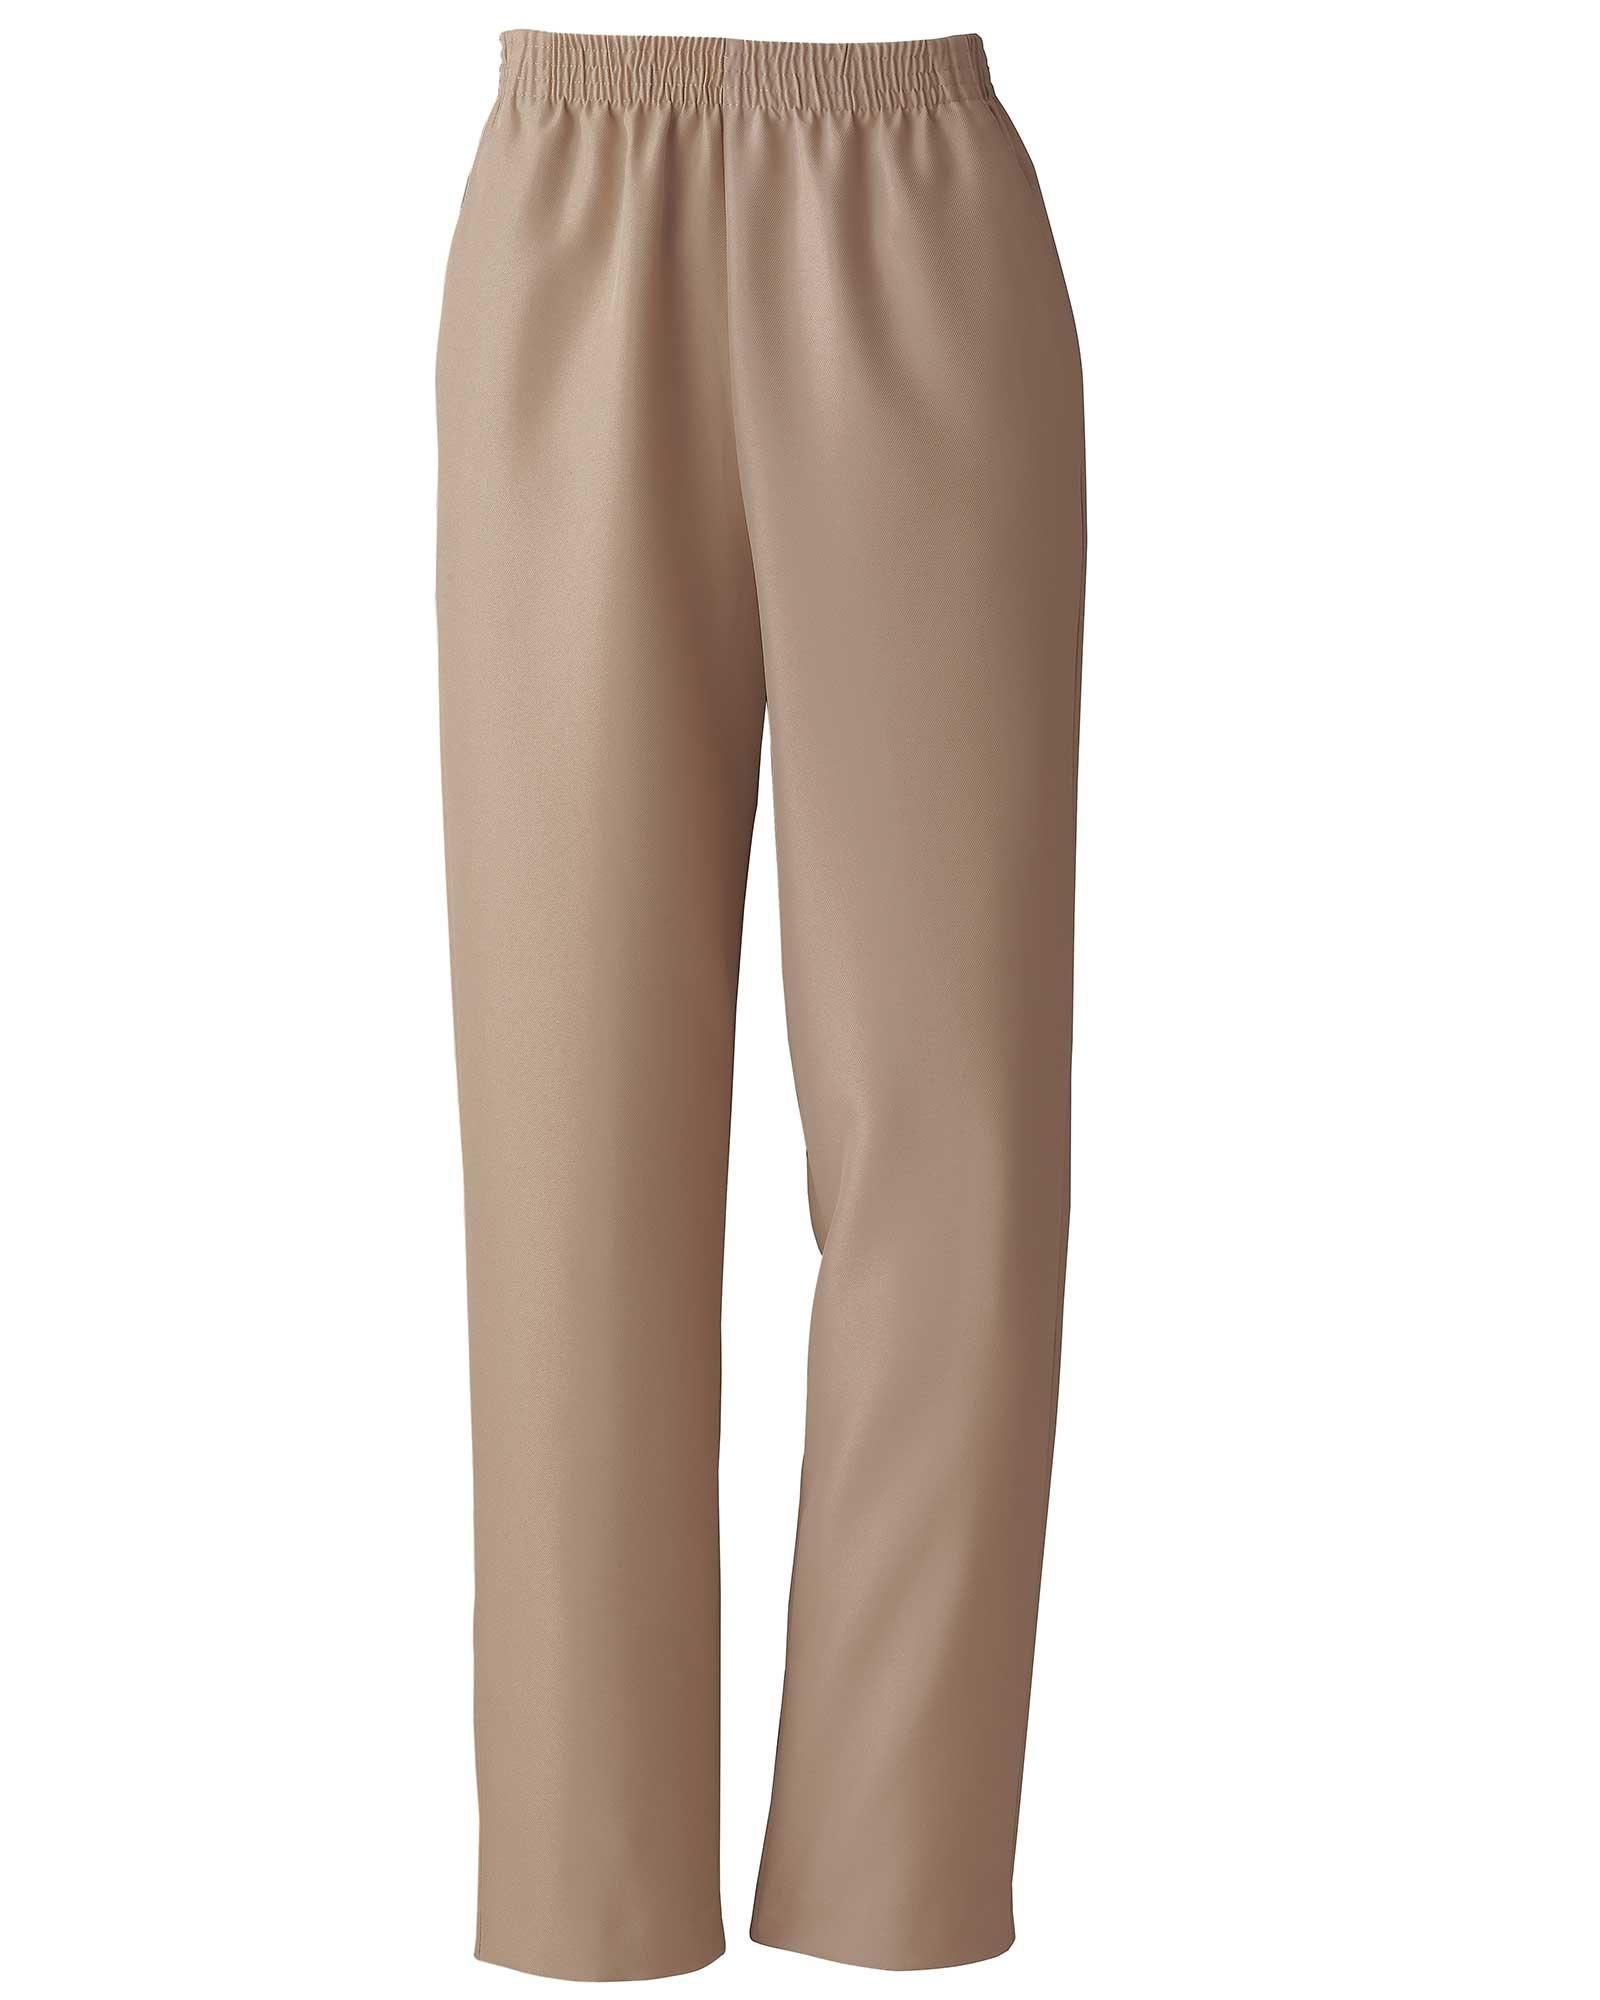 Donnkenny Elastic-Waist Gabardine Pull-On Pants, Khaki, 10P